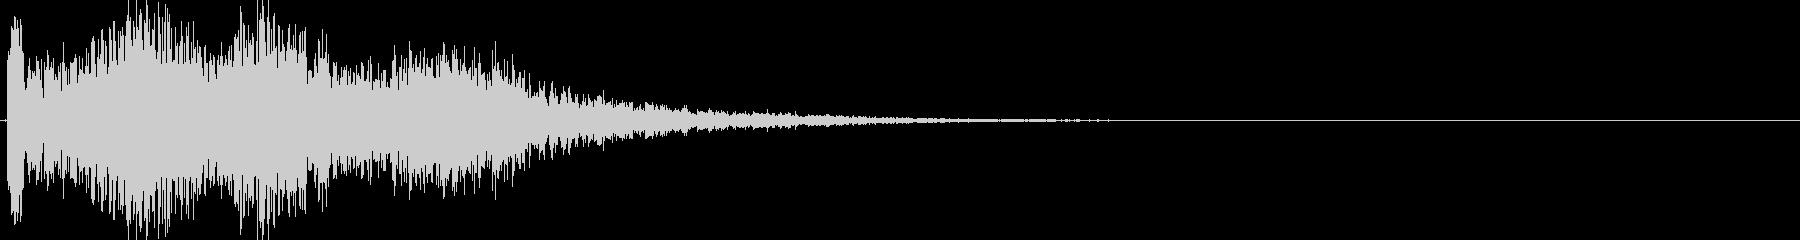 CINEMATIC BRAAMS_03の未再生の波形